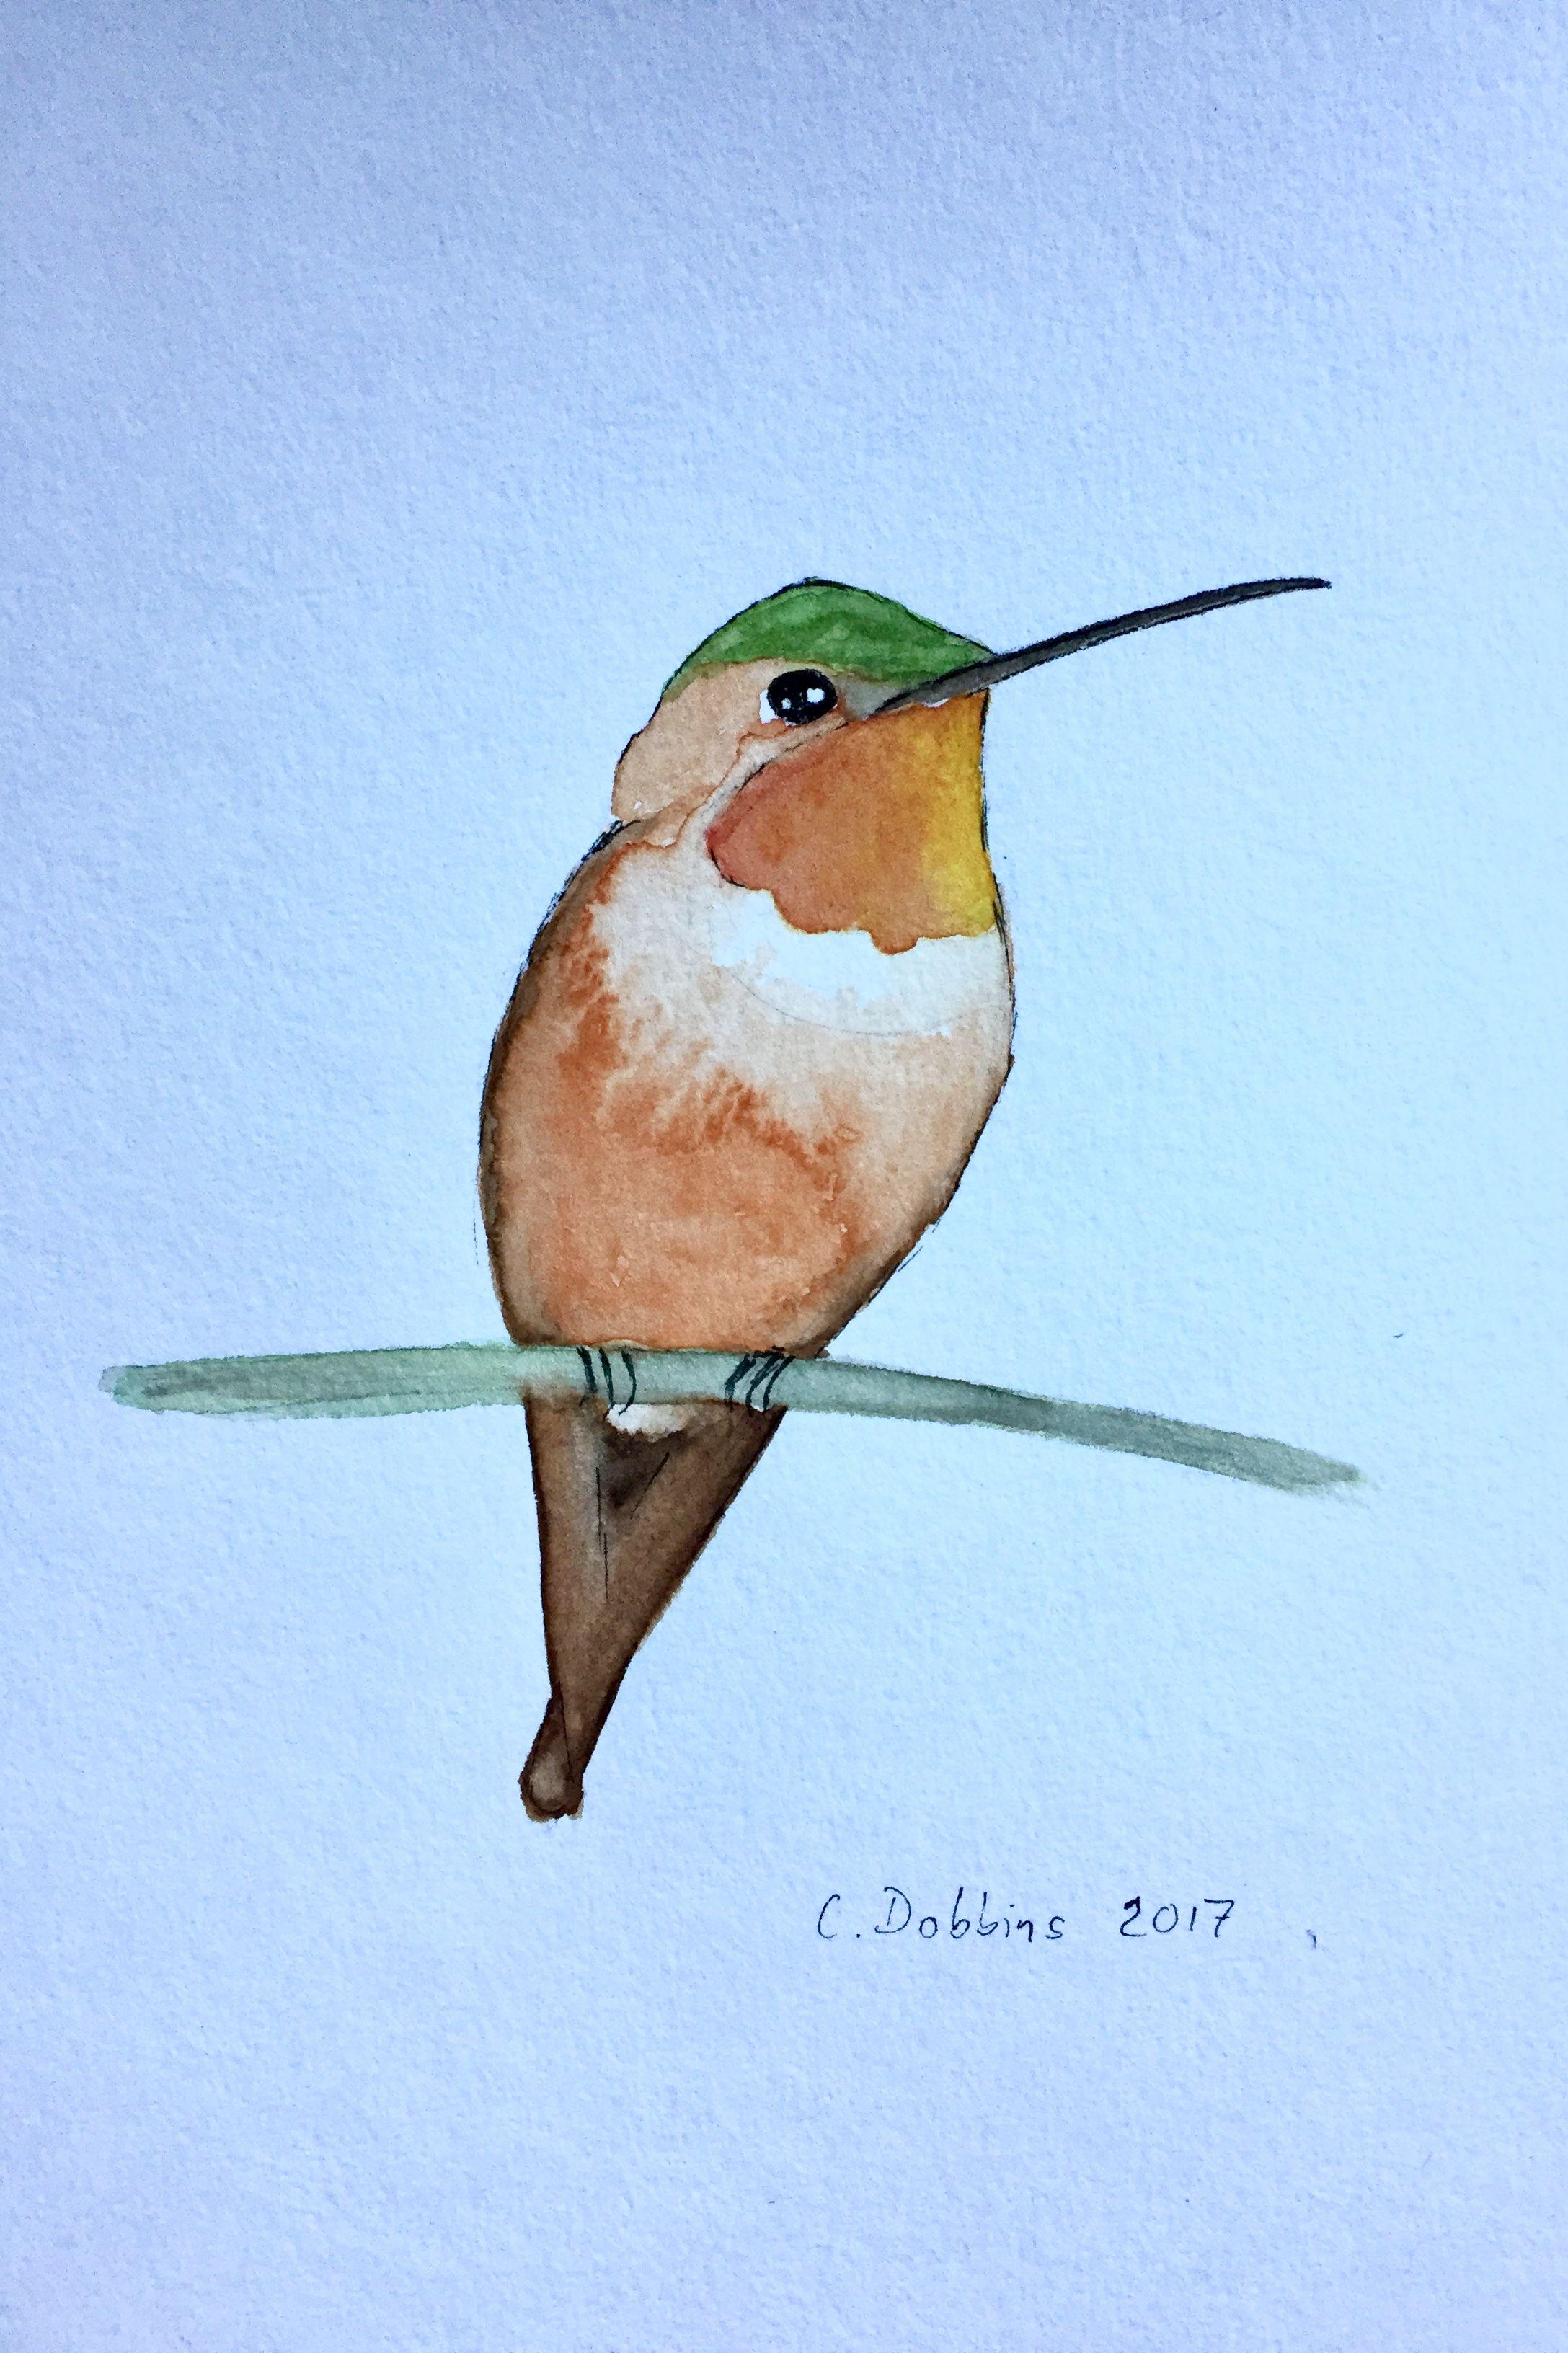 Rufous hummingbird (Selasphorus rufus) | Collections | Pinterest